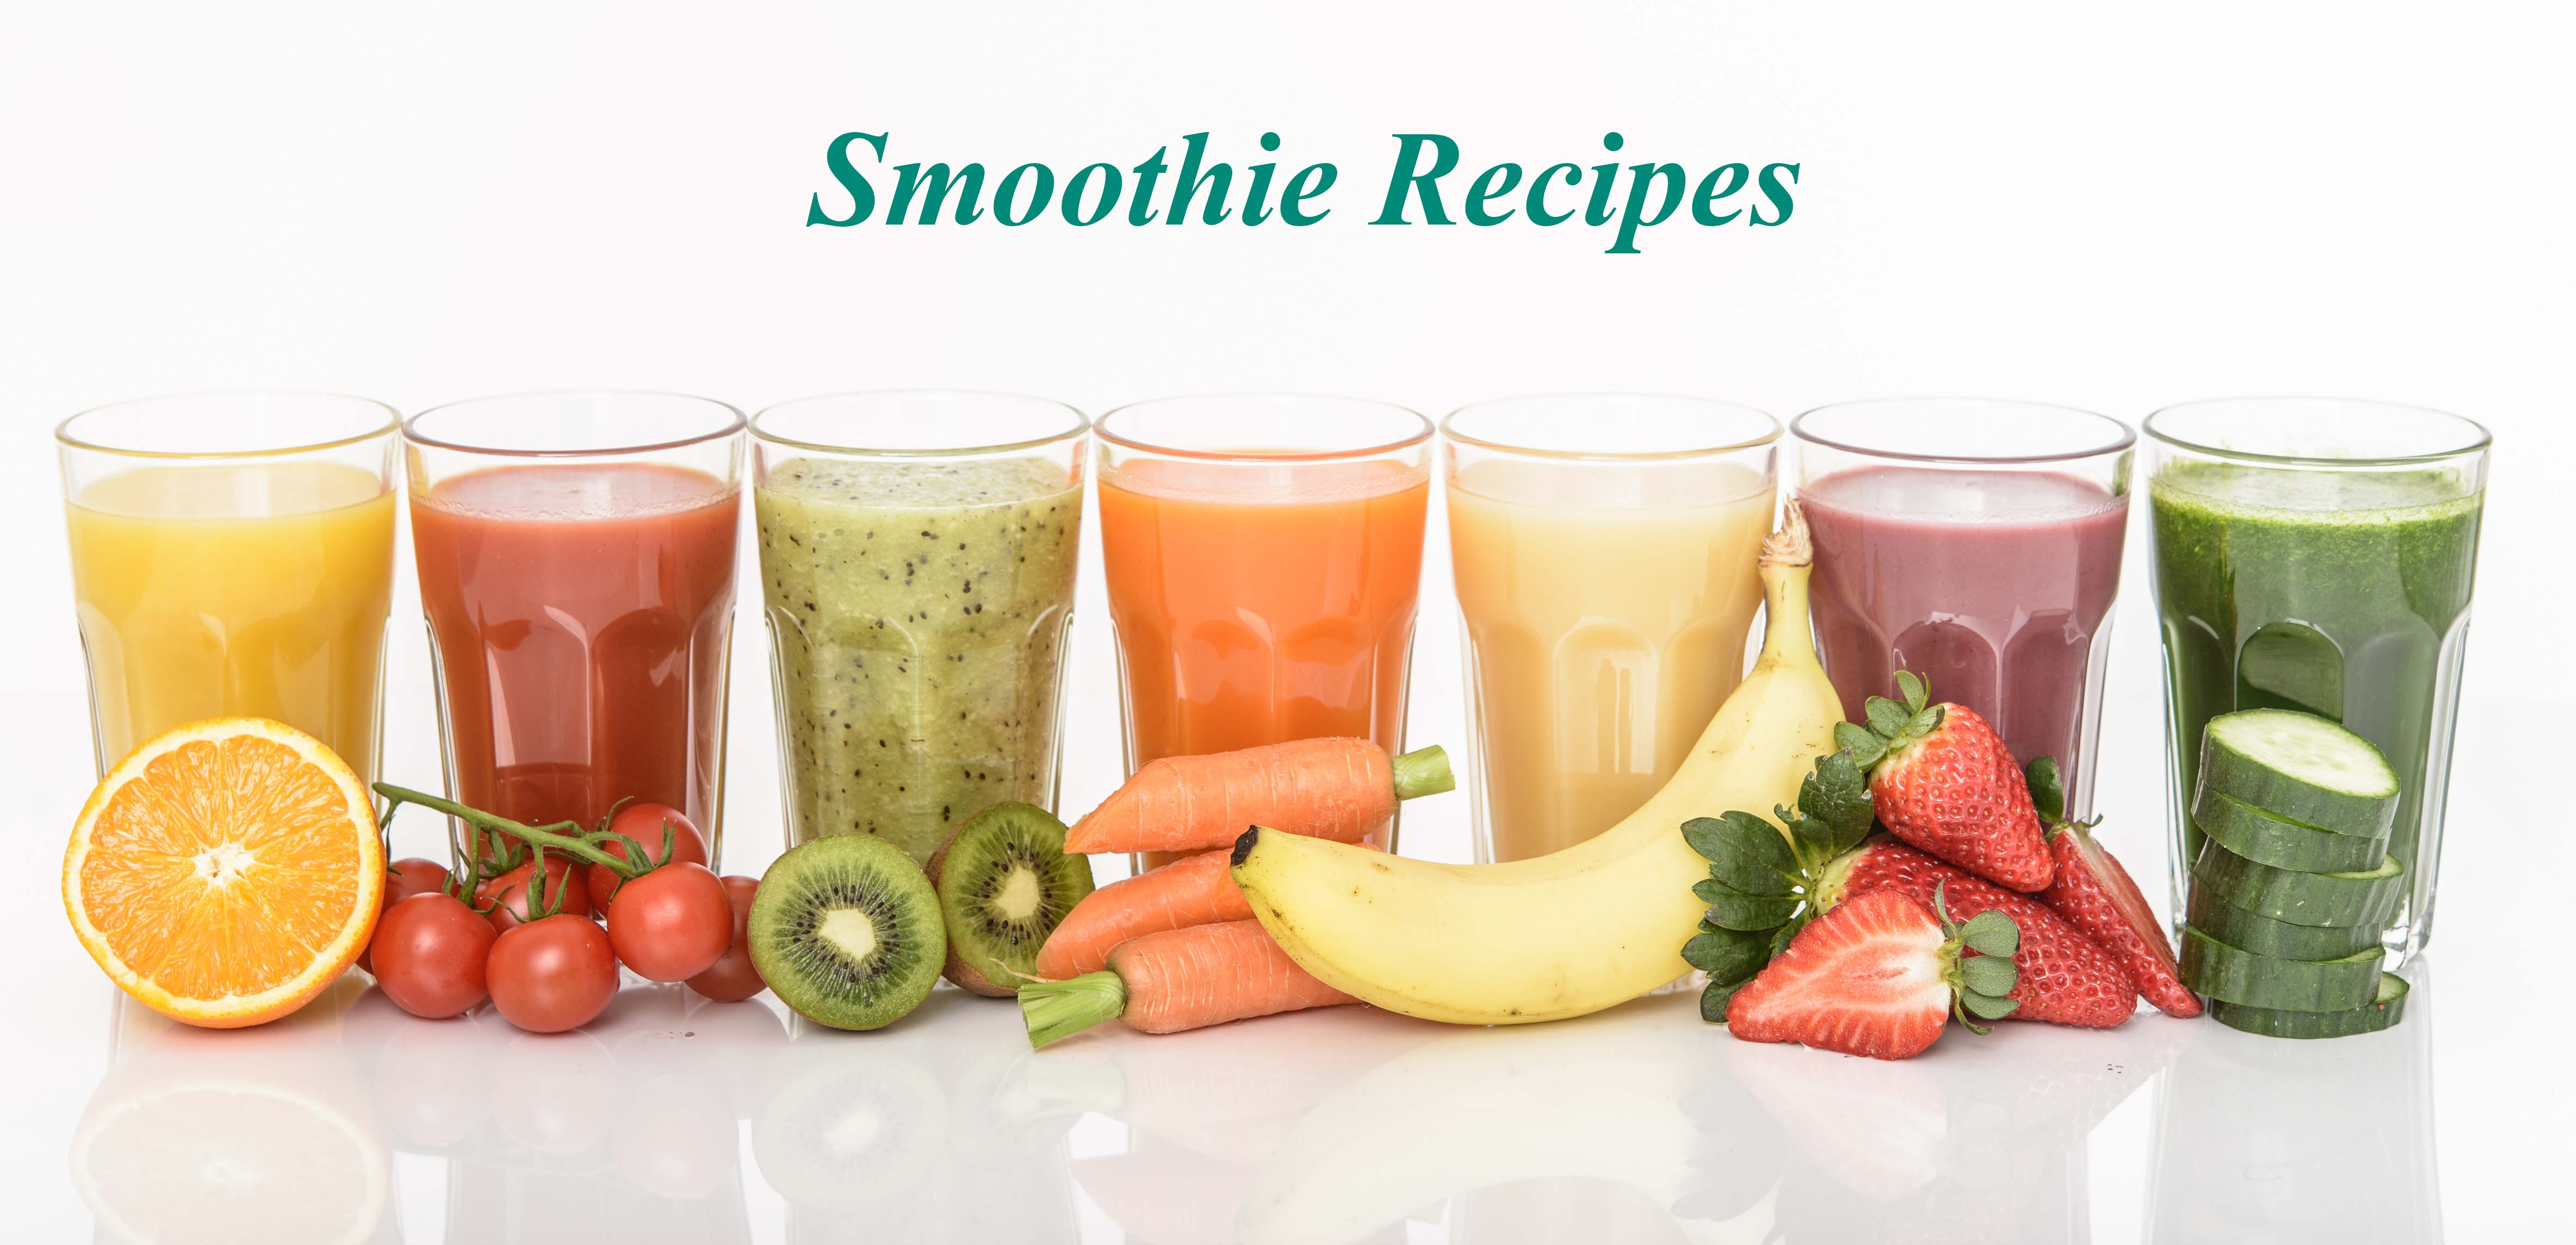 smoothie-recipes-image.jpg